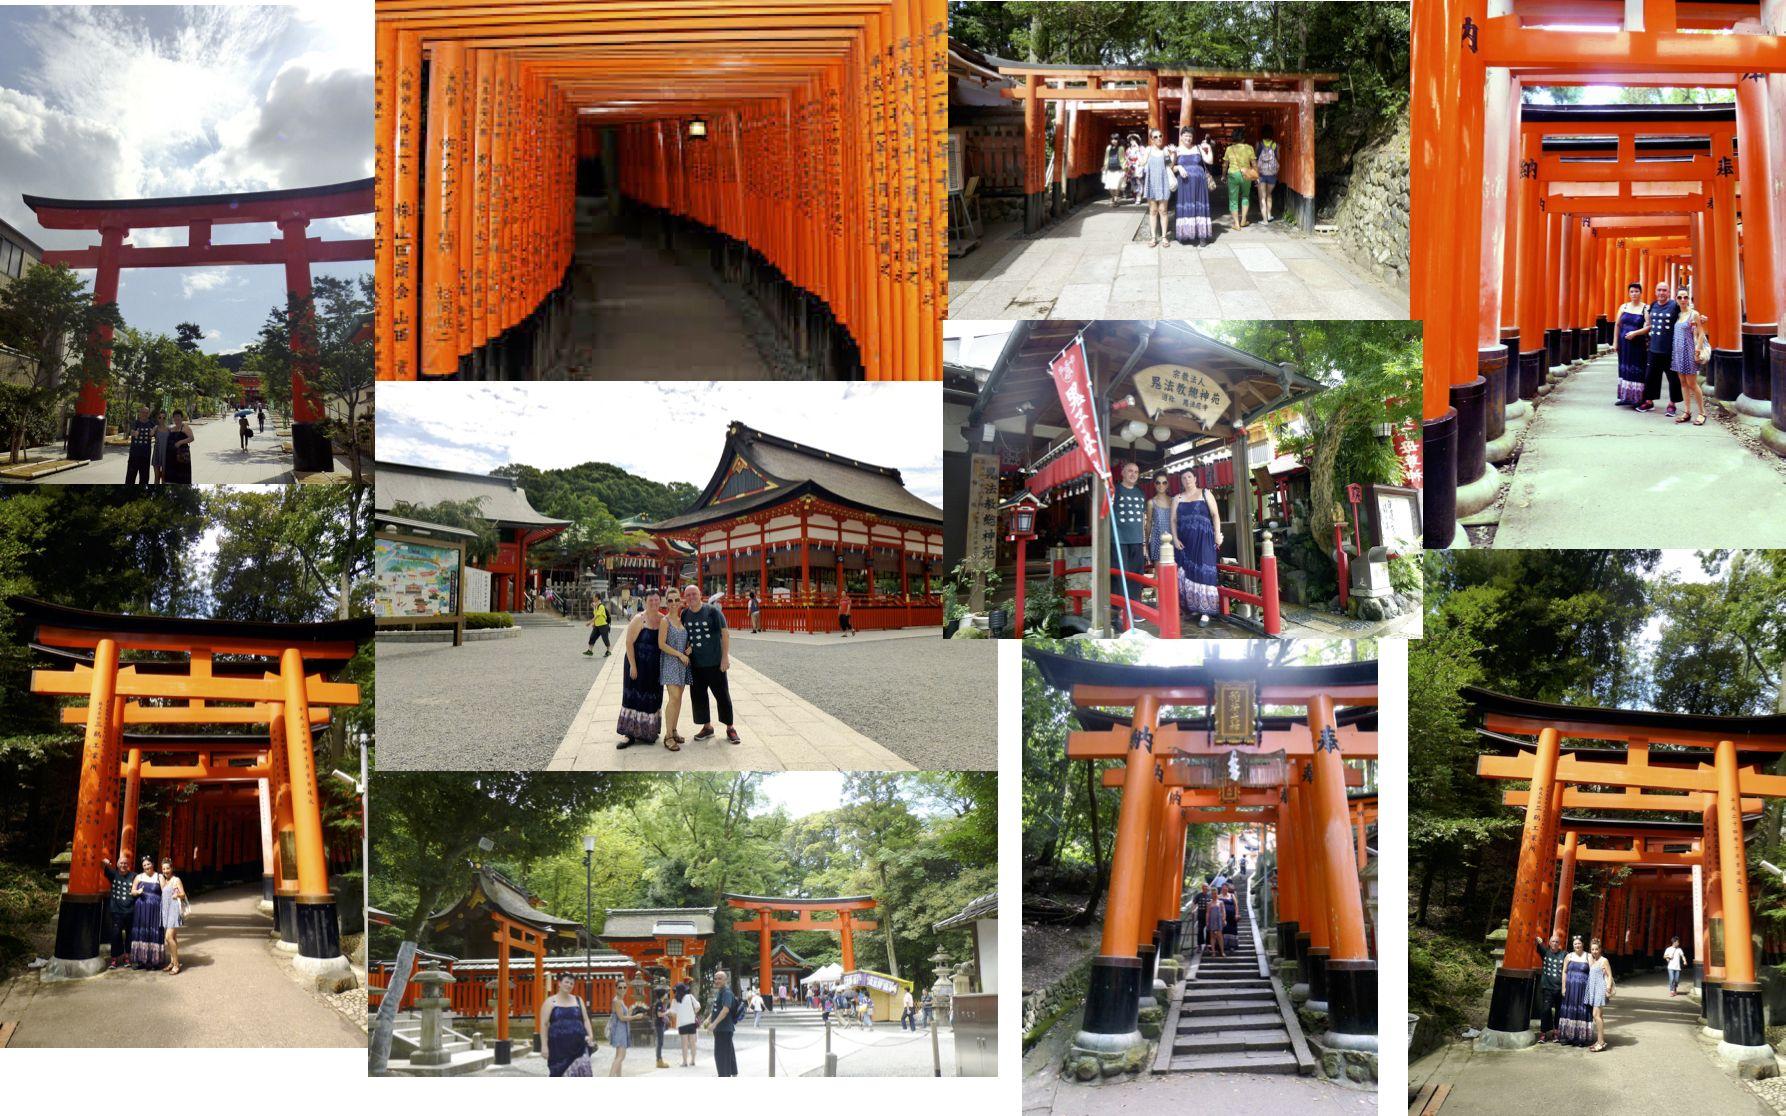 Shiatsu Master en Japón, Fushimi Inari Taisha 伏見稲荷大社 camino de los toris rojos